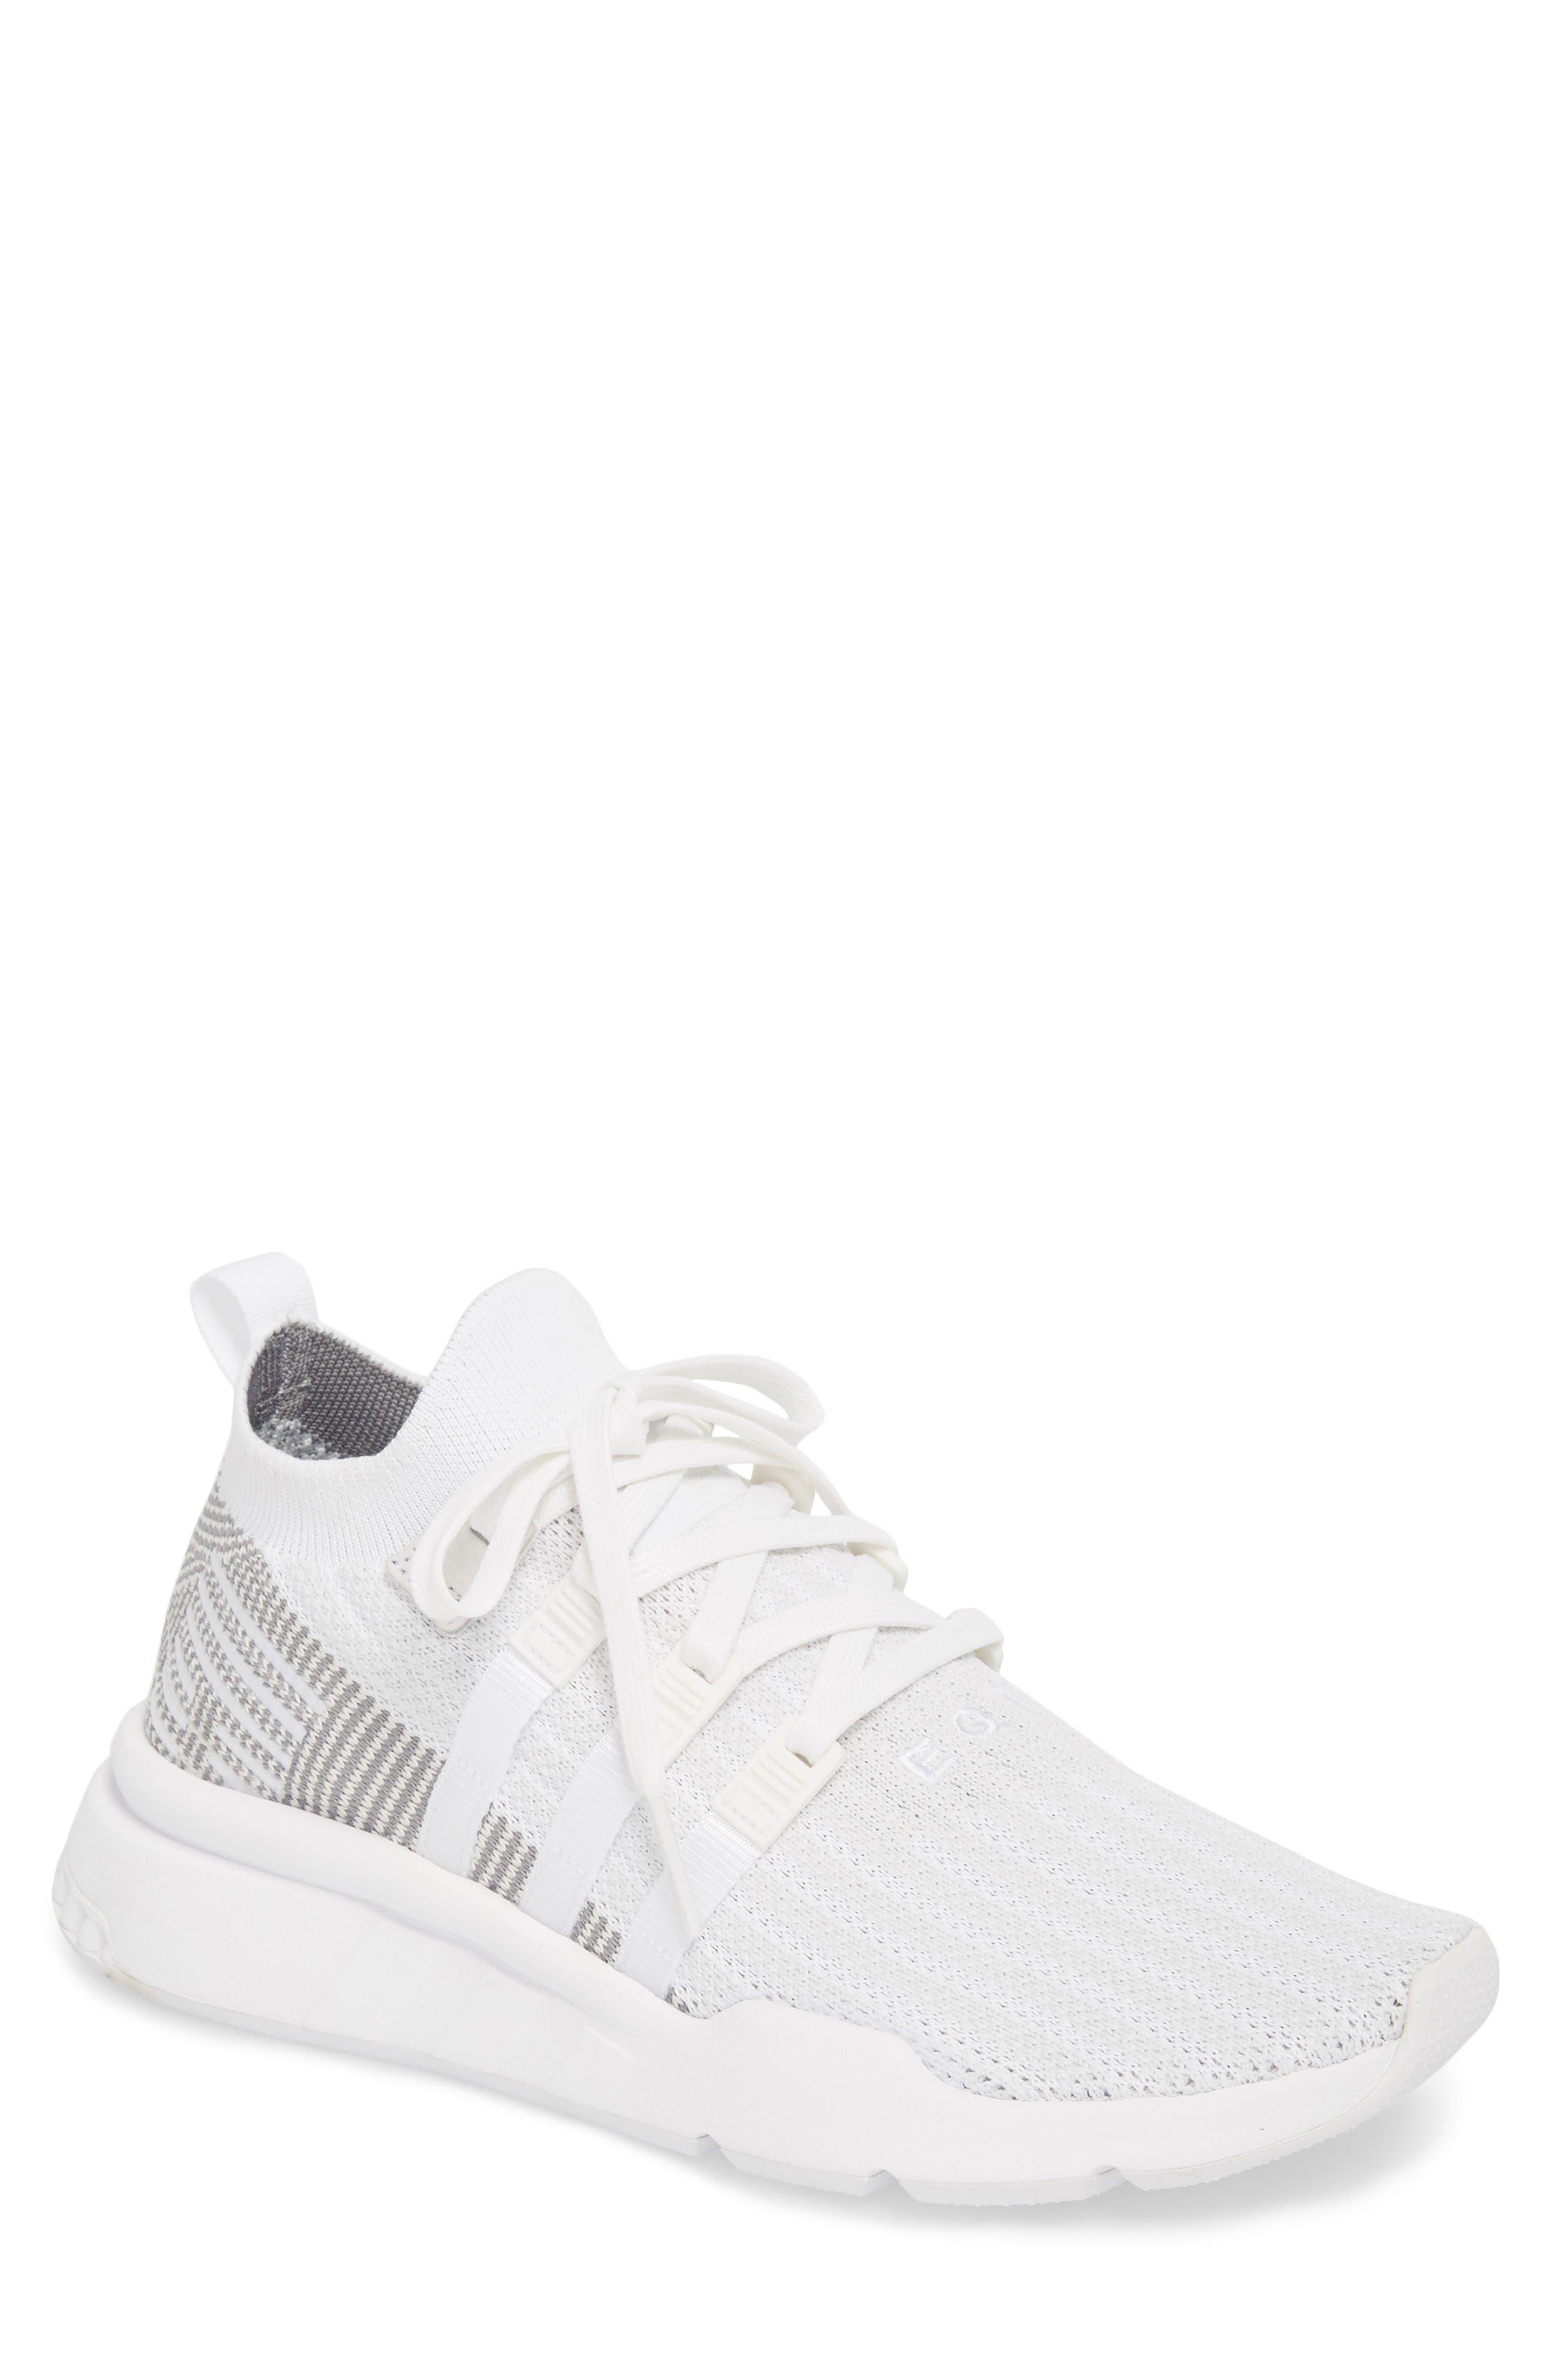 EQT Support Mid ADV Primeknit Sneaker,                         Main,                         color, WHITE/ WHITE/ GREY